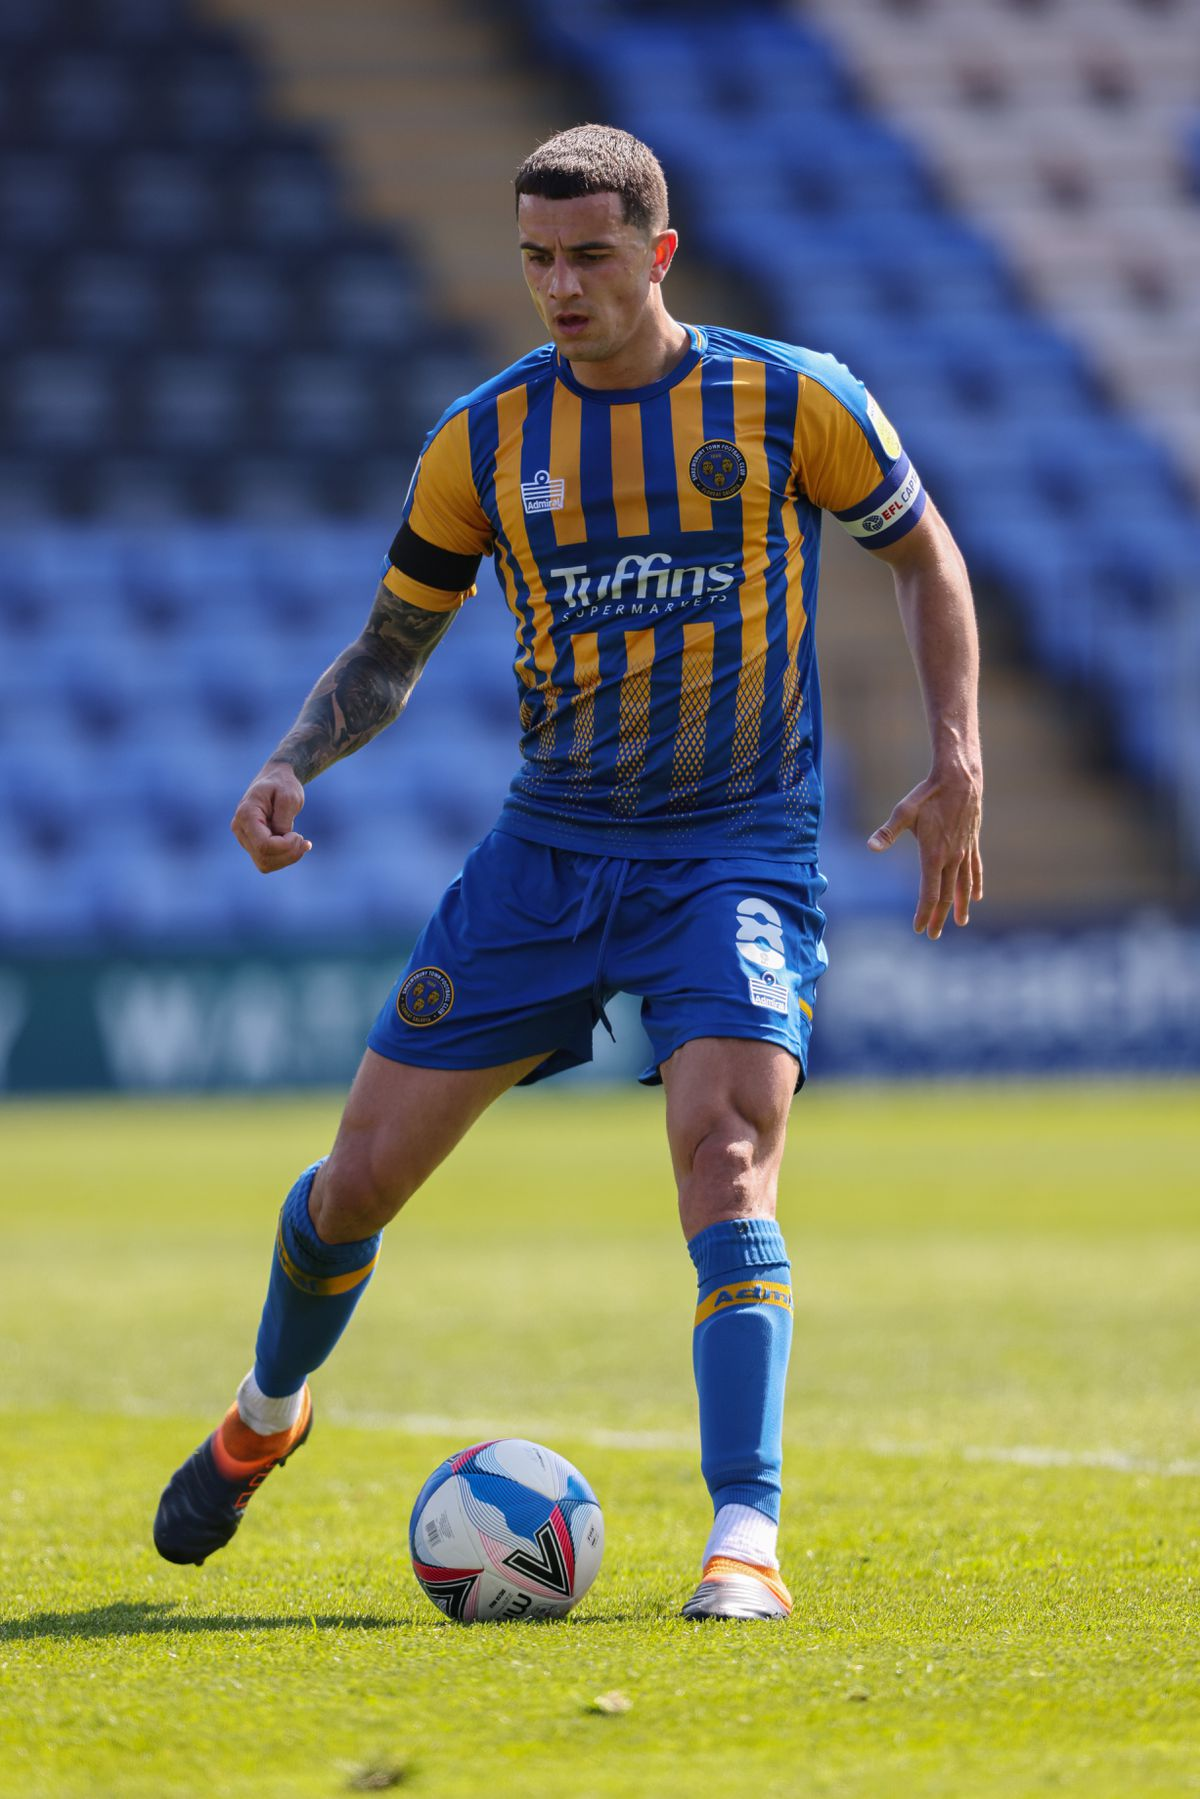 Oliver Norburn of Shrewsbury Town.